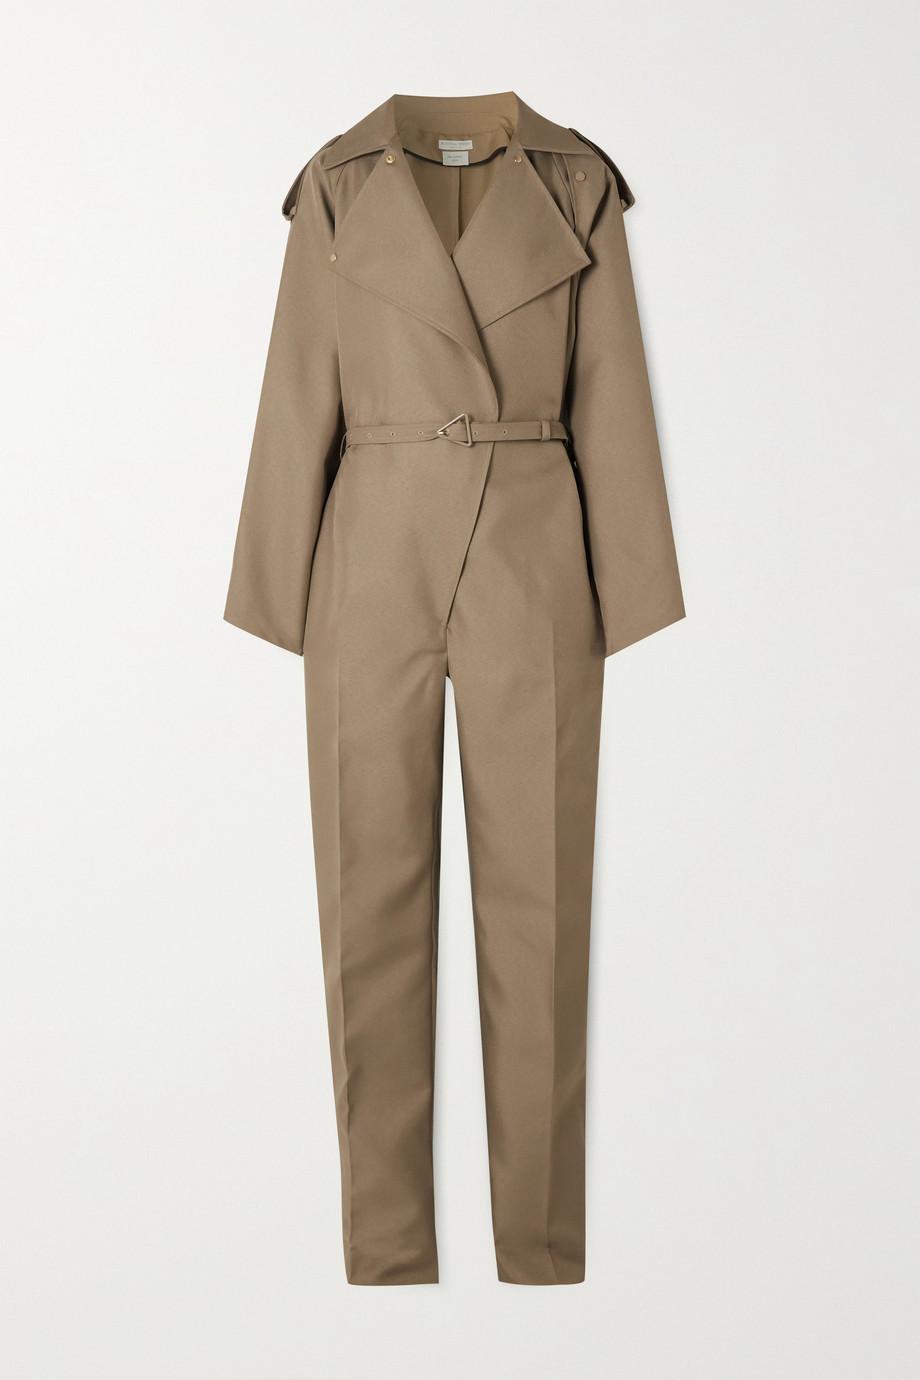 Bottega Veneta Combi-pantalon en coutil à ceinture